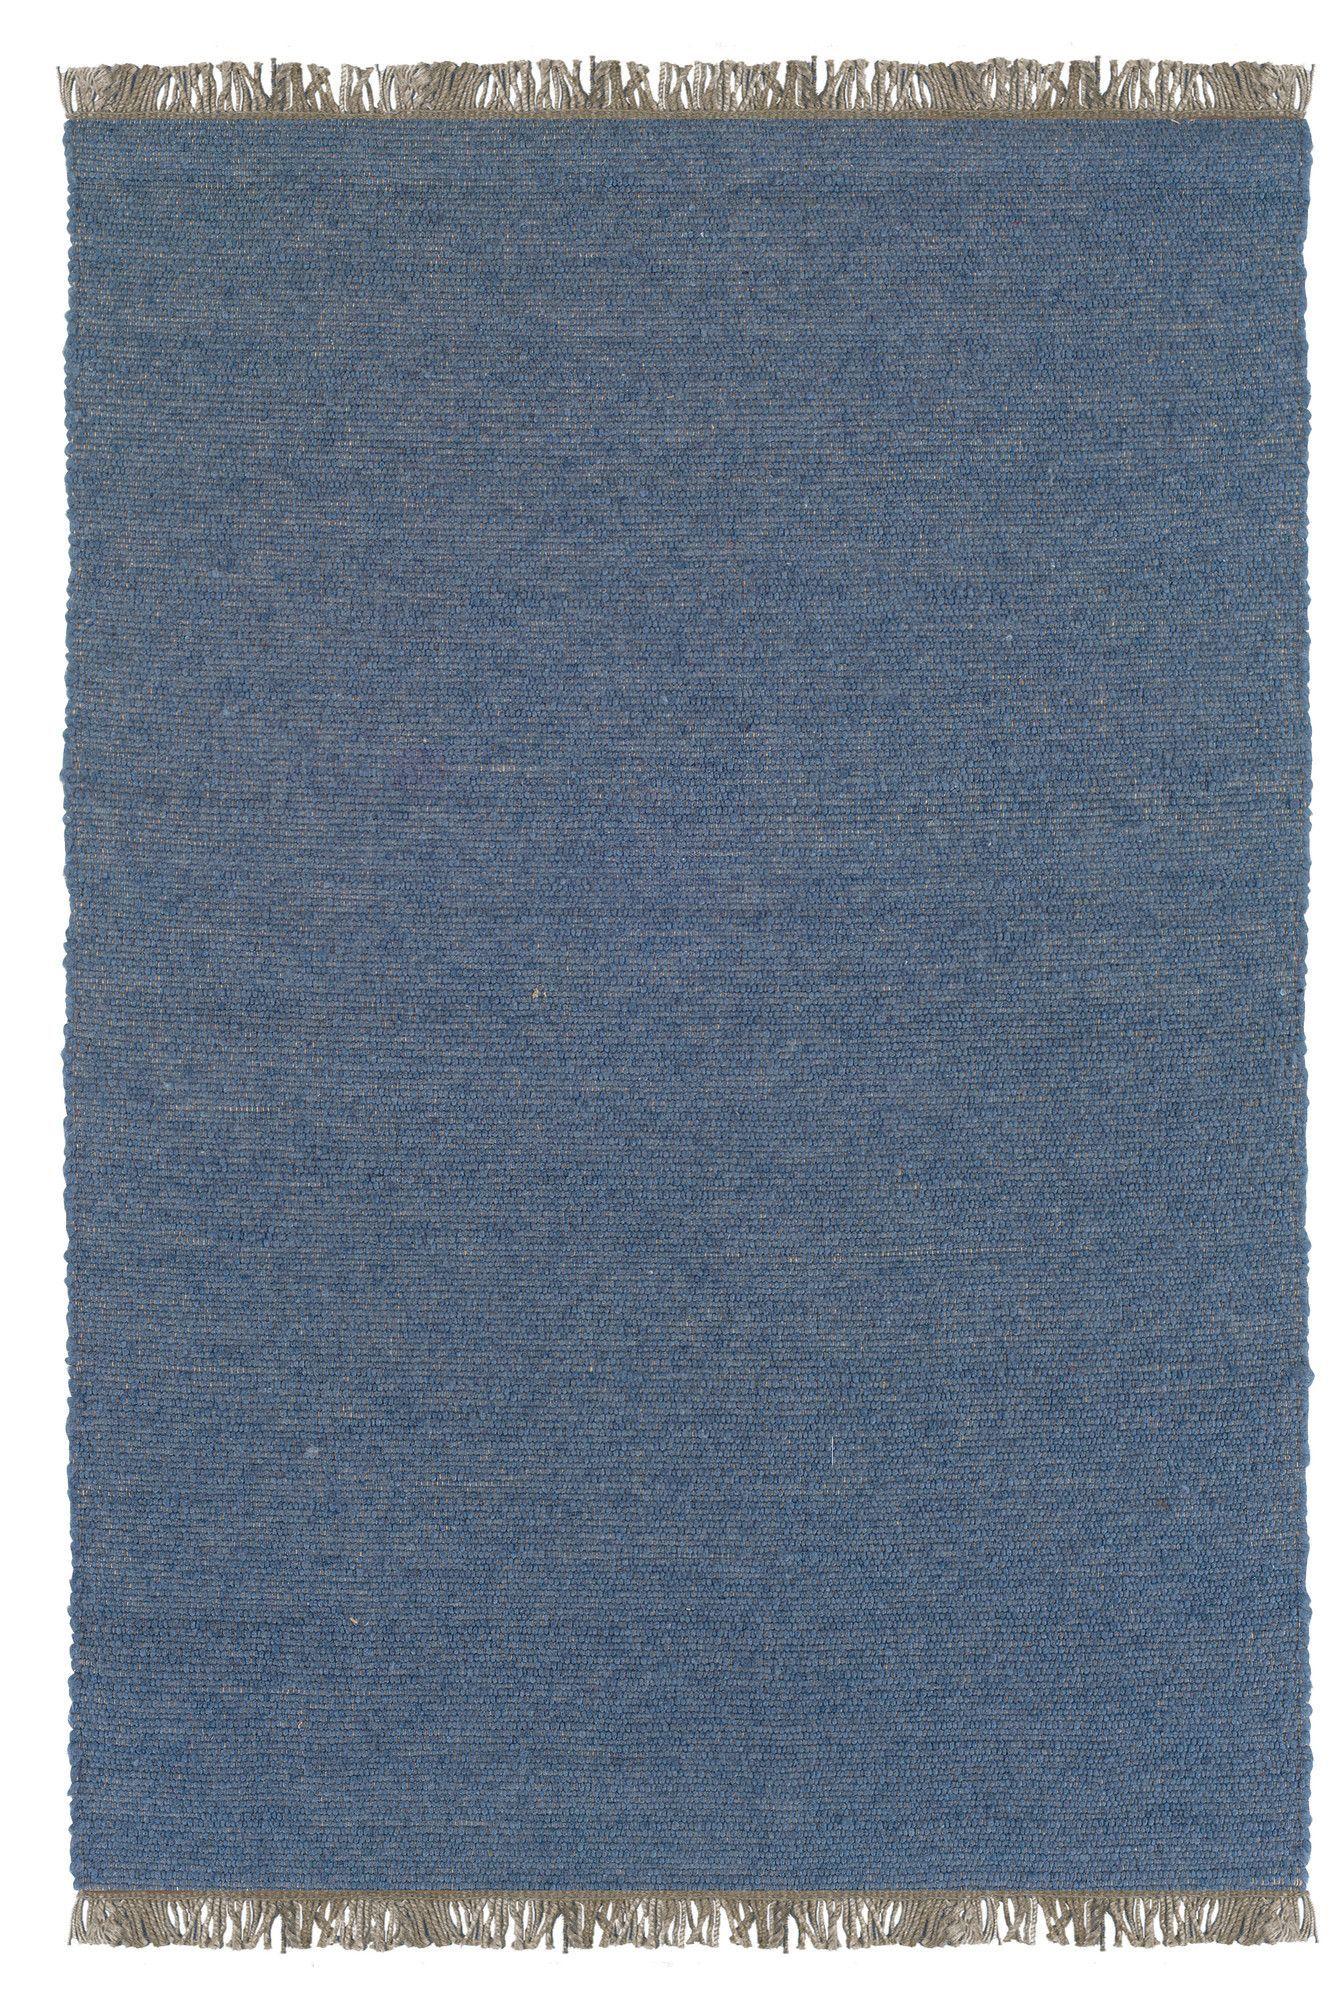 Vanderbilt Hand-Woven Blue Area Rug